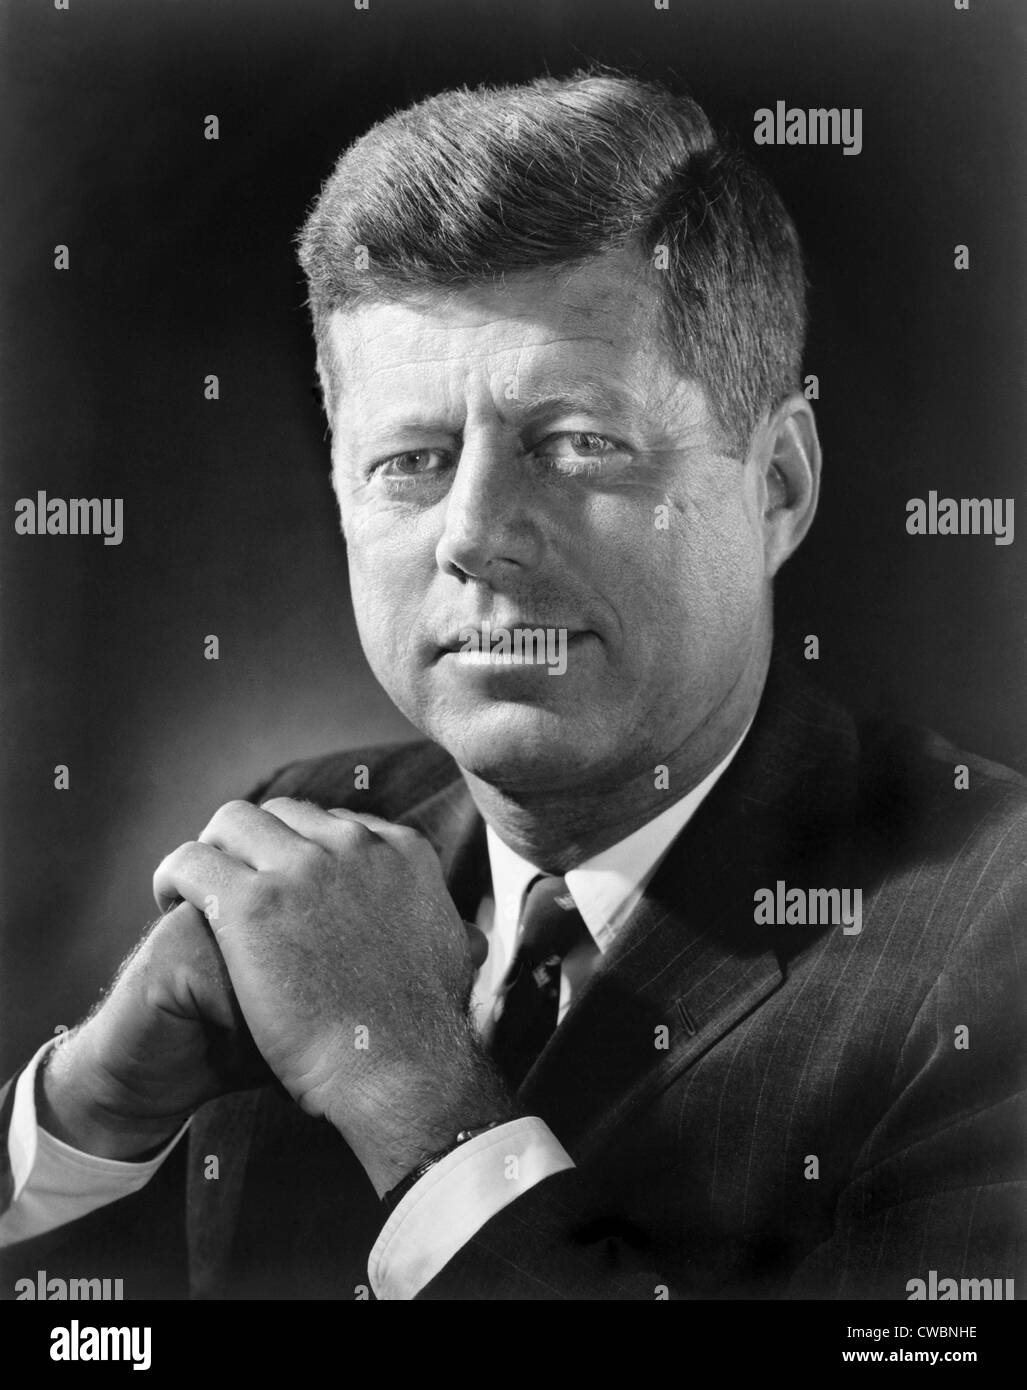 President john f kennedy idea